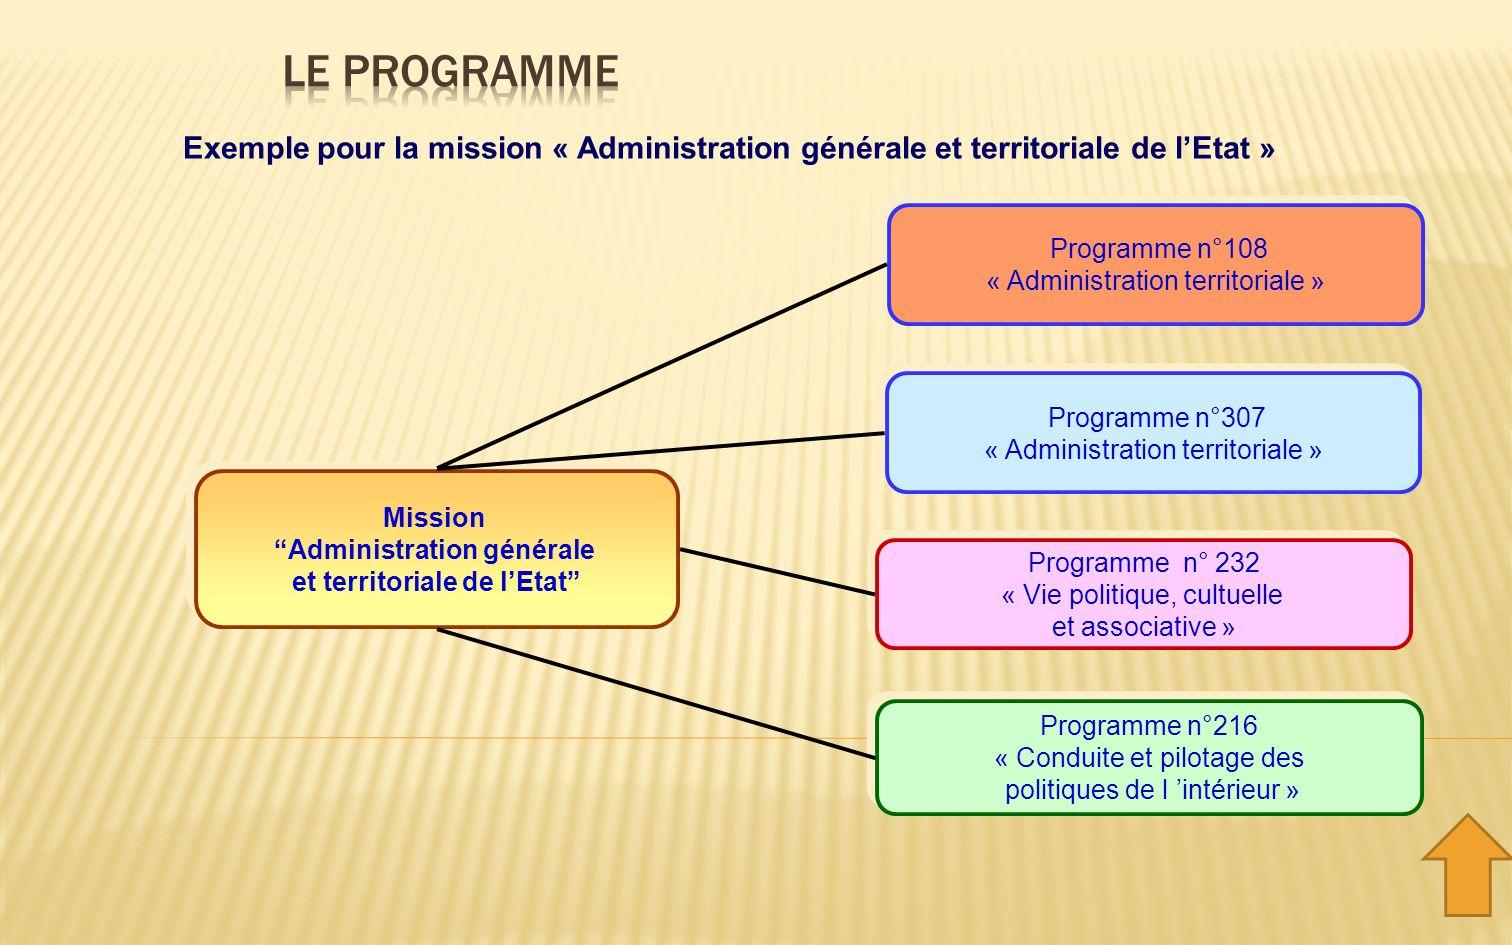 Les missions Relations avec les collectivités territoriales Relations avec les collectivités territoriales Sécurité civile Sécurité civile Administrat